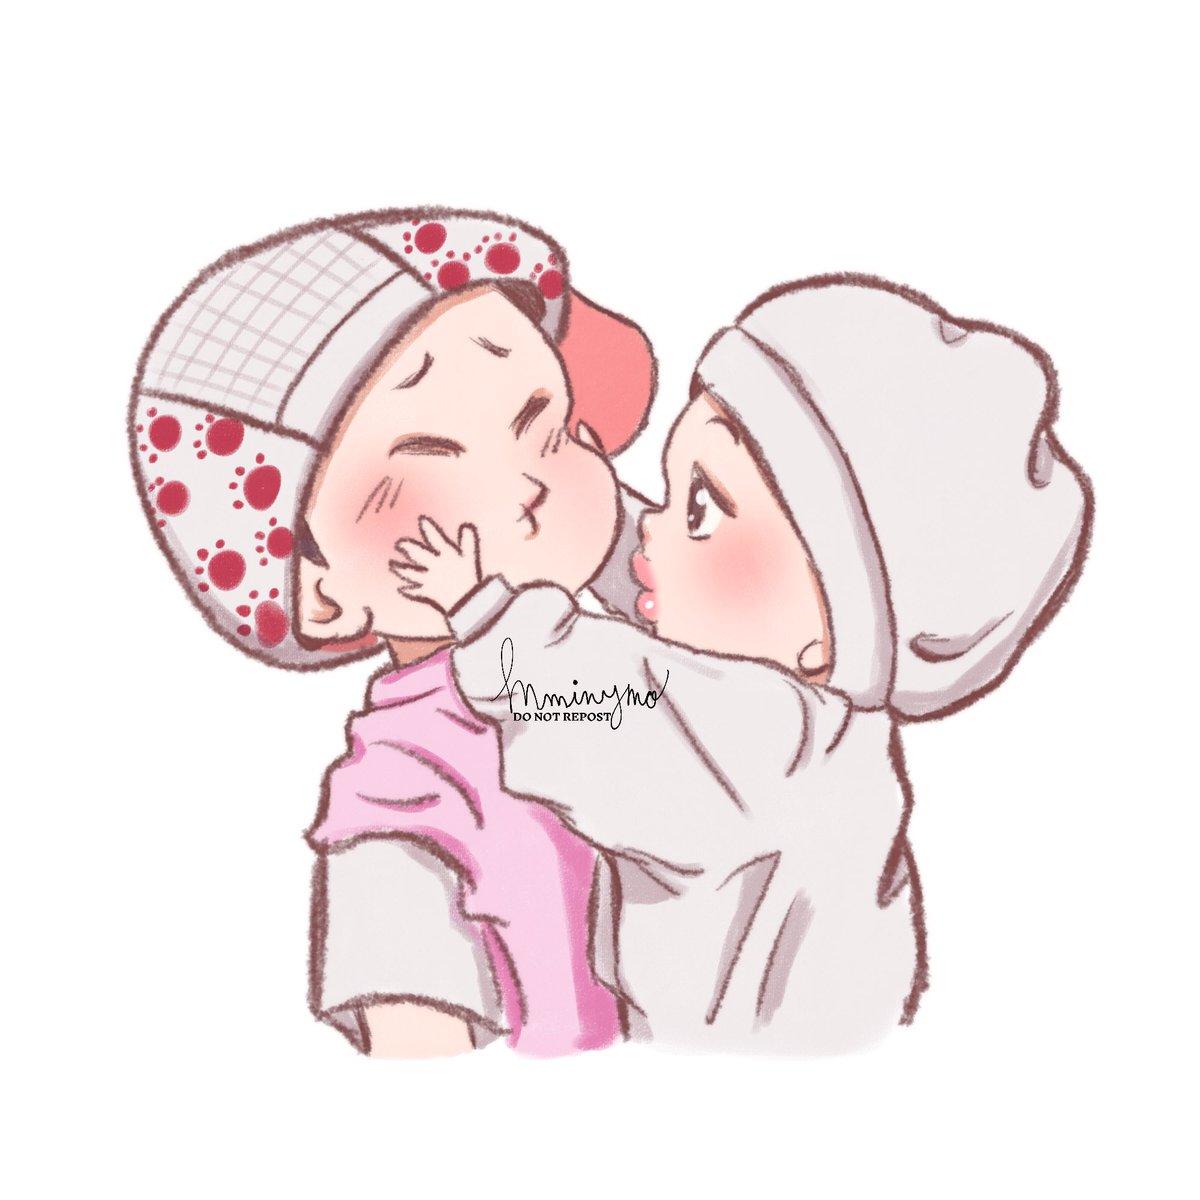 🐱 💛 🐥 Baby Jiminie 🍡 likes baby Yoonie's 🥟 cheeks too much. #yoonmin #fanart #슙짐 #짐슙